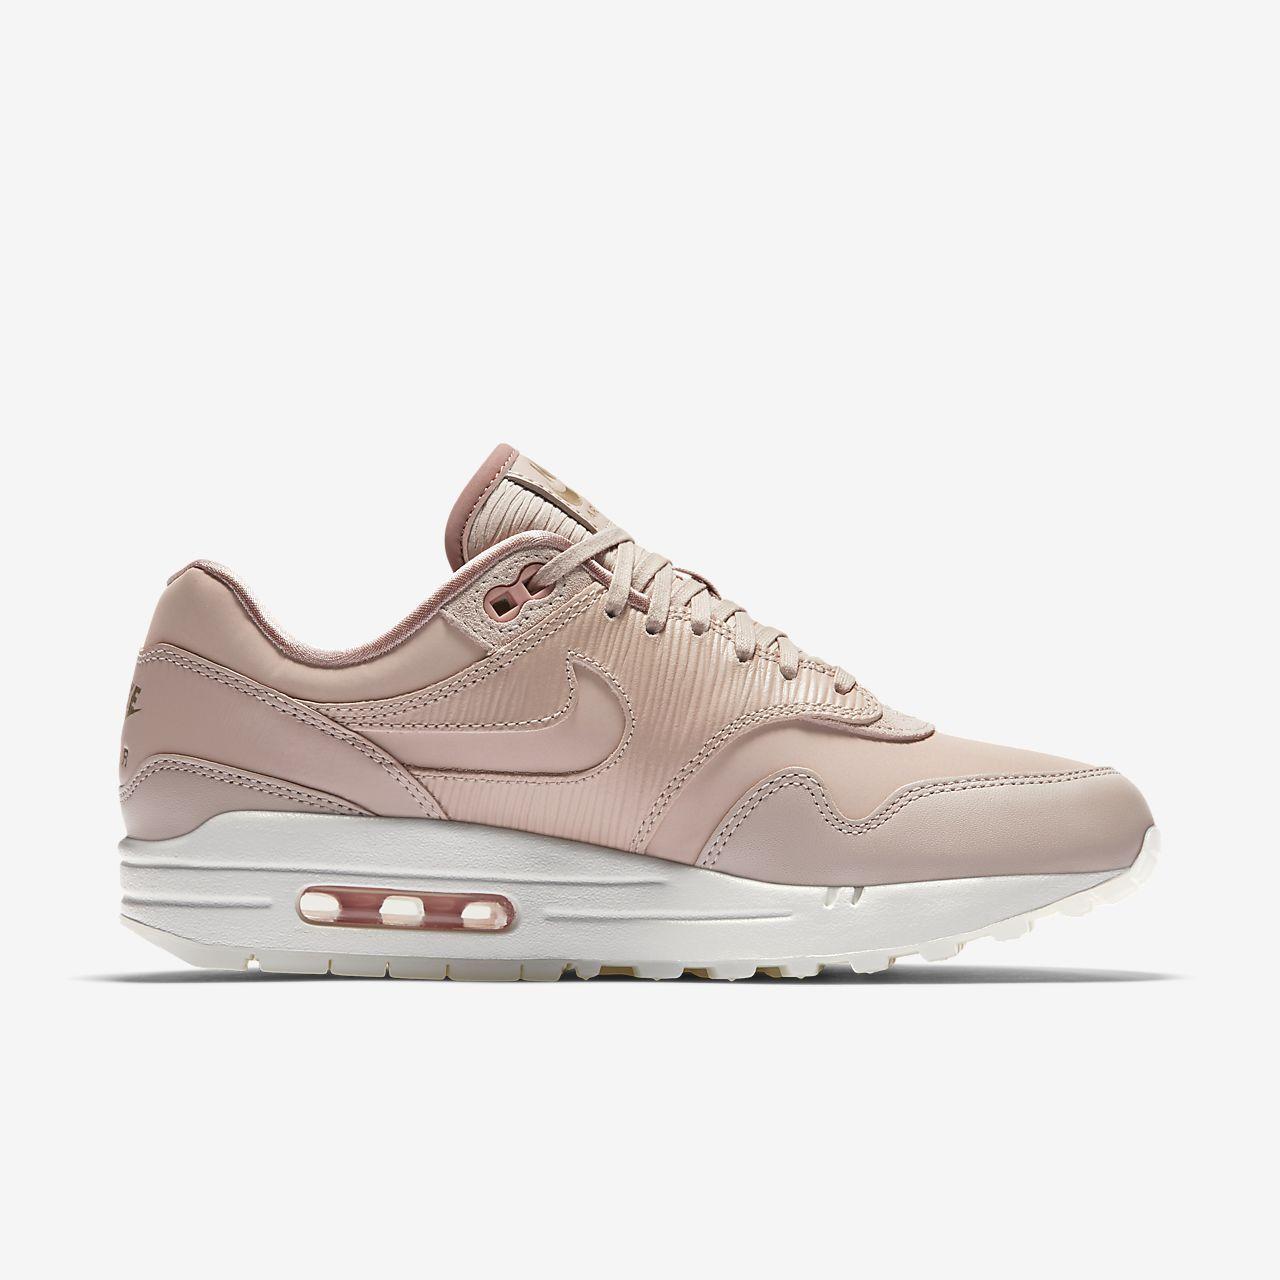 Nike Air Max 1 Femmes De Prime